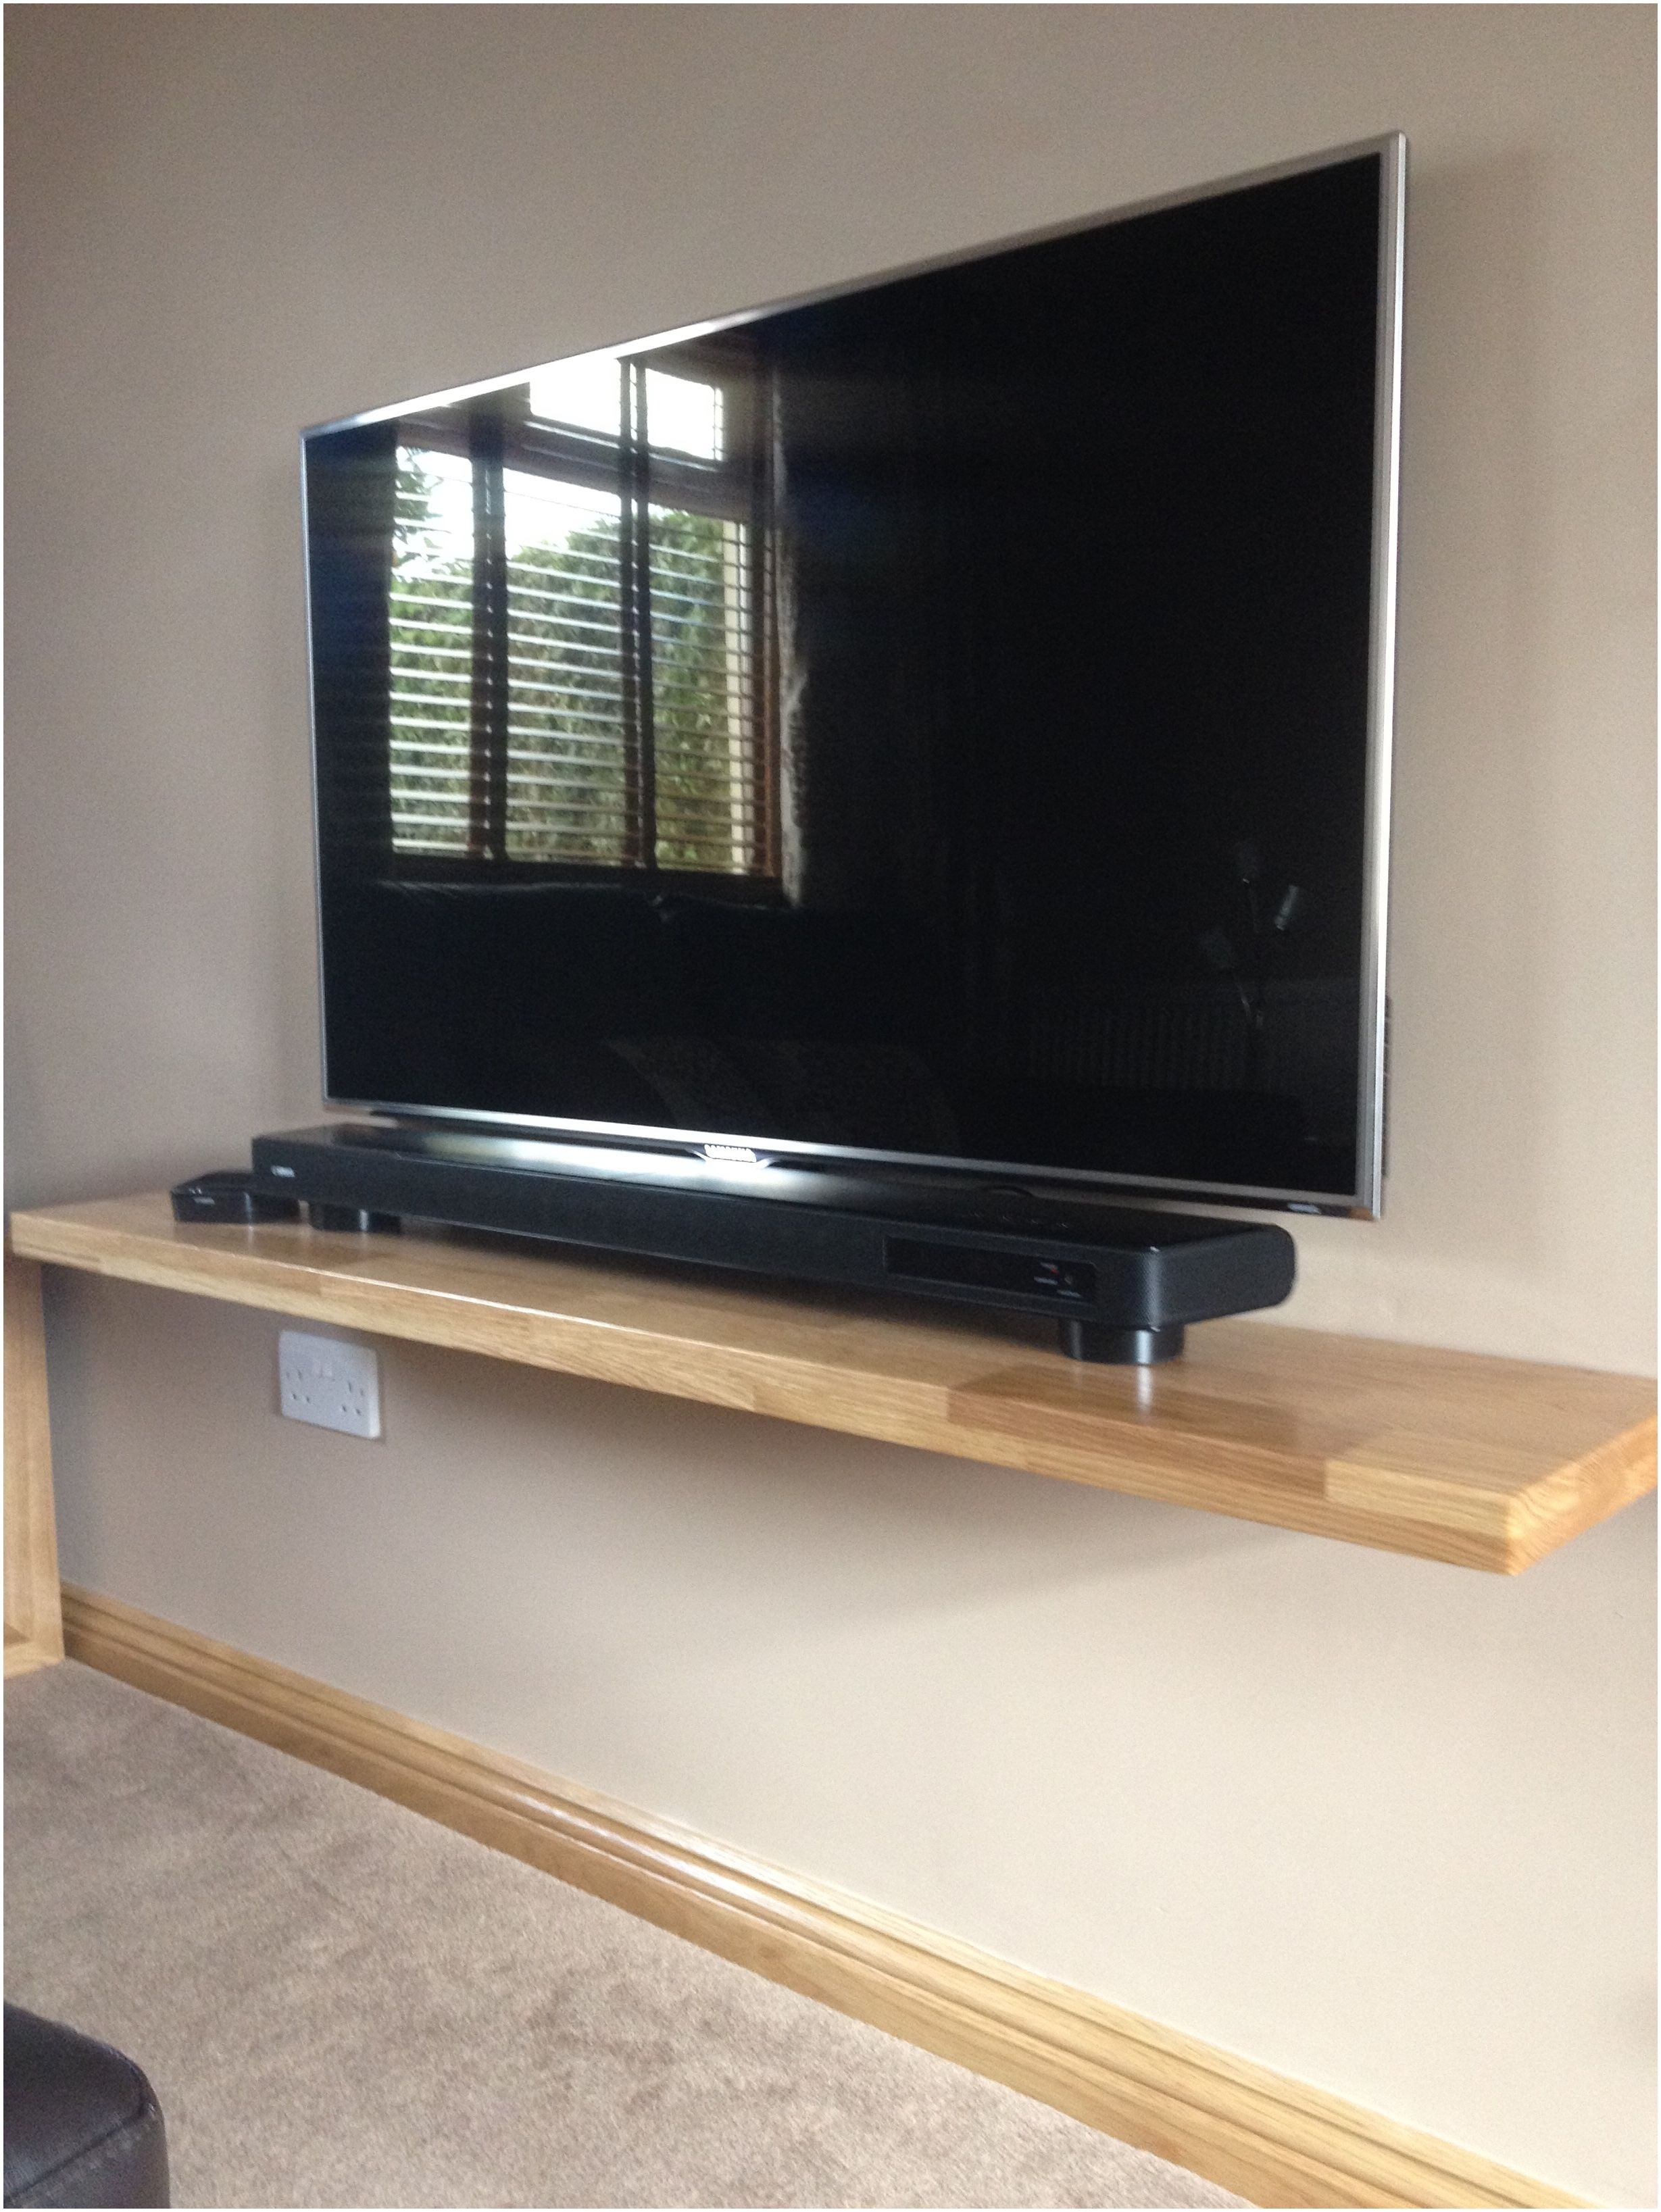 Floating Shelf Under Wall Mounted Tv Tv Wall Shelves Wall Mount